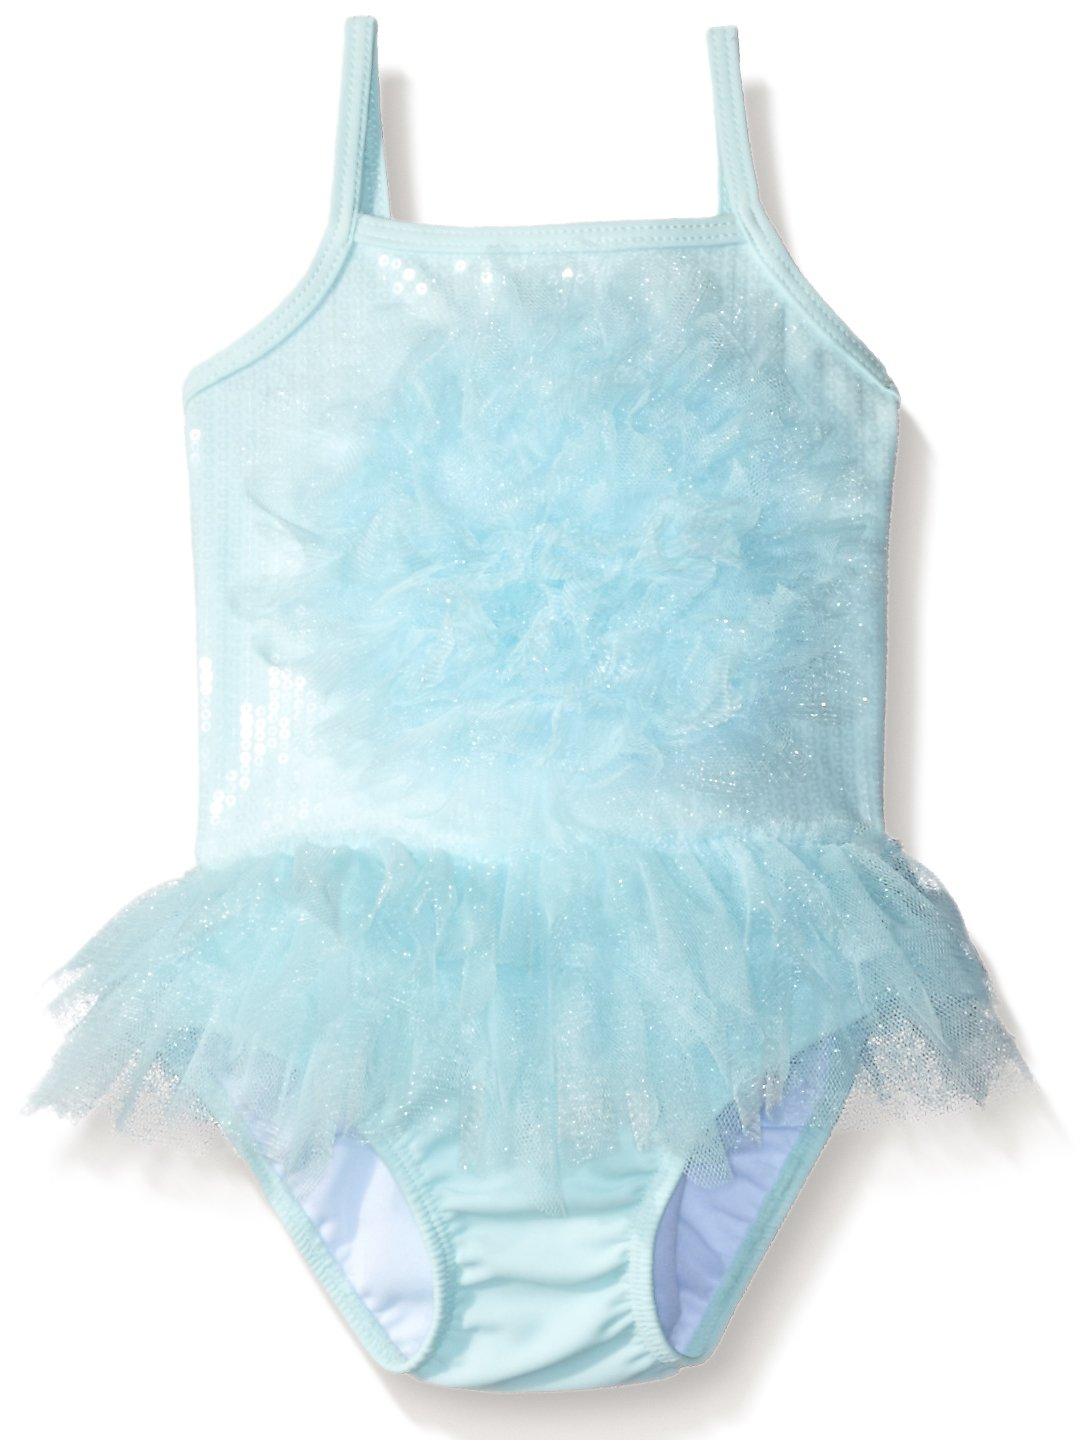 Kate Mack Girls' Candy Cloud Skirted One Piece Baby Swim Tank, Aqua, 24 by Kate Mack